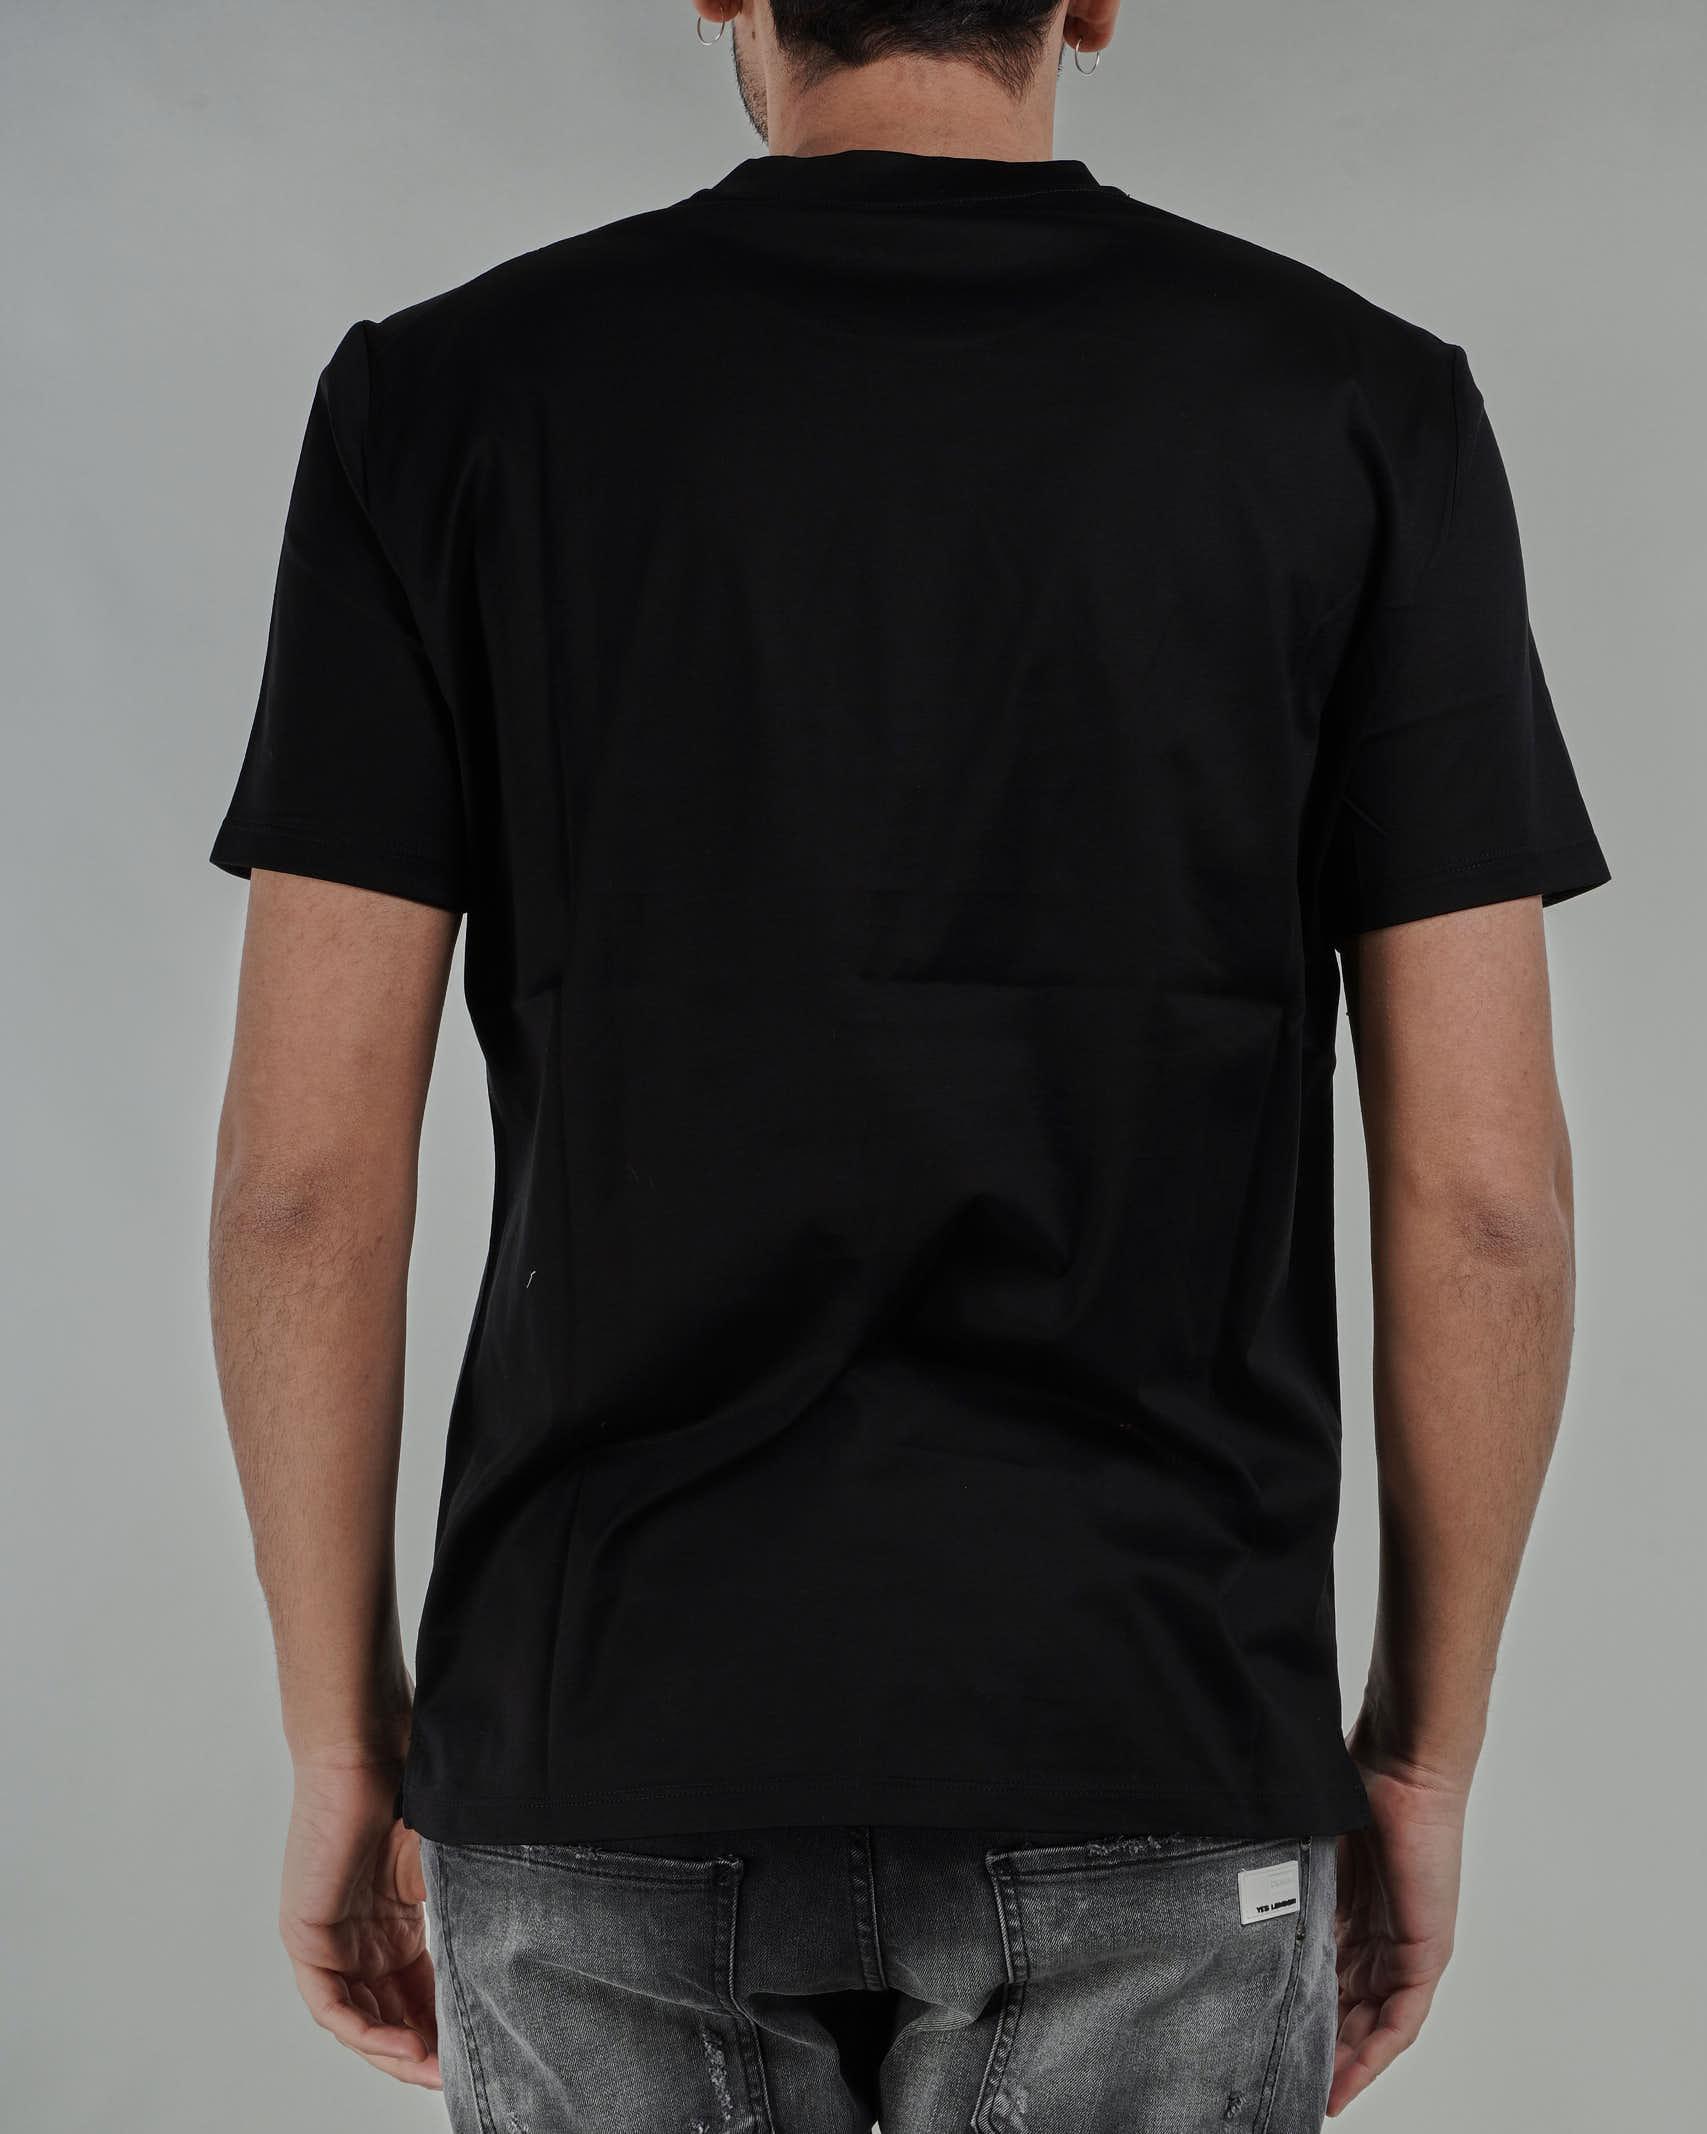 T-shirt basic in cotone Paolo Pecora PAOLO PECORA   T-shirt   F07140549000